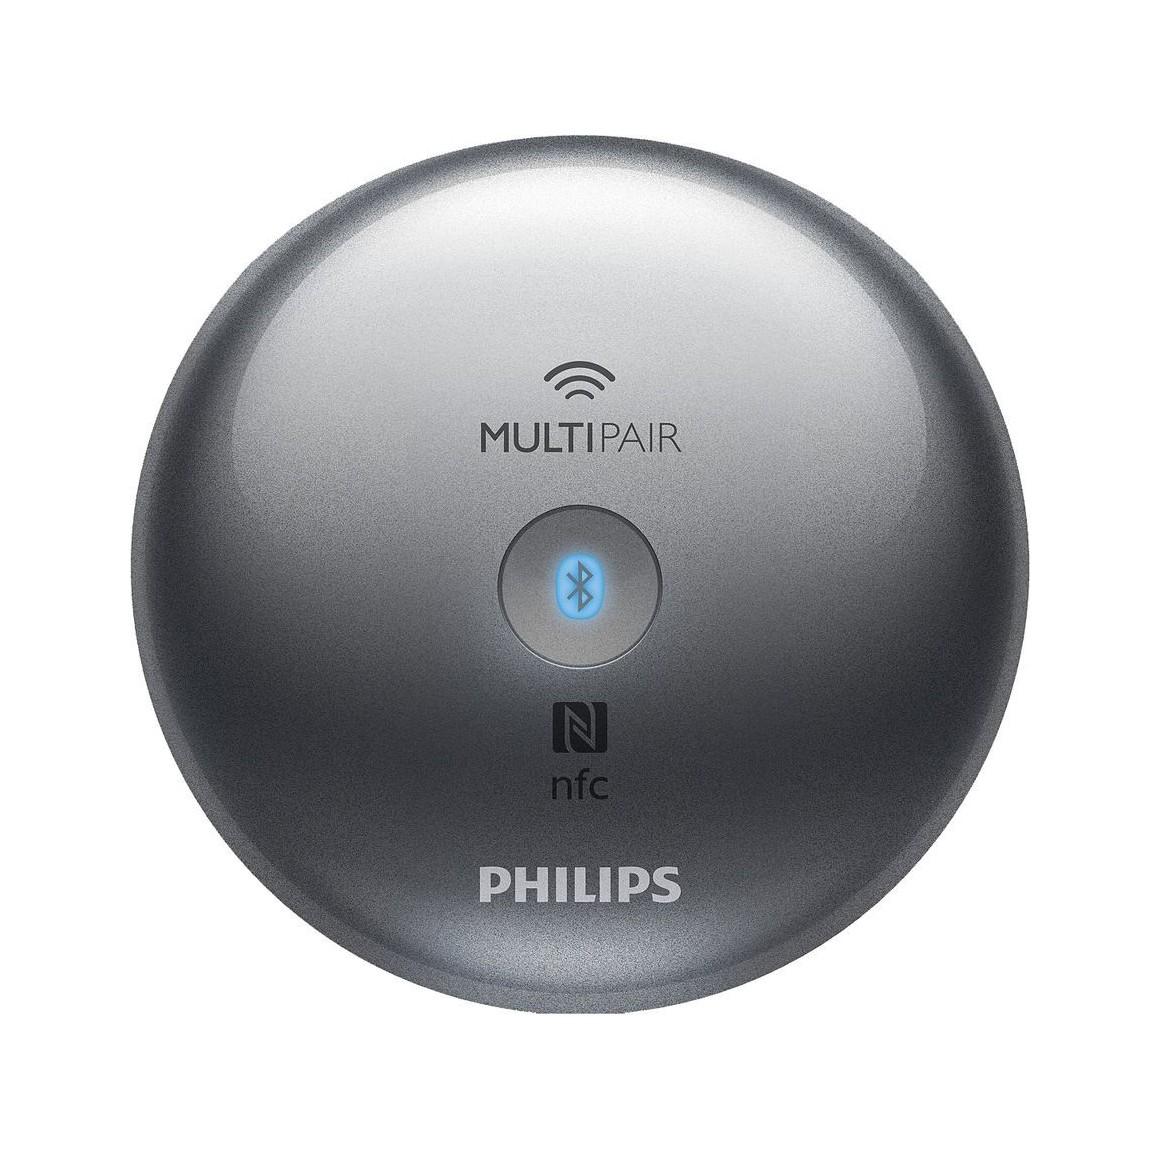 philips aea2700 adaptateur hi fi bluetooth nfc multipair universel avec prise rca et audio. Black Bedroom Furniture Sets. Home Design Ideas